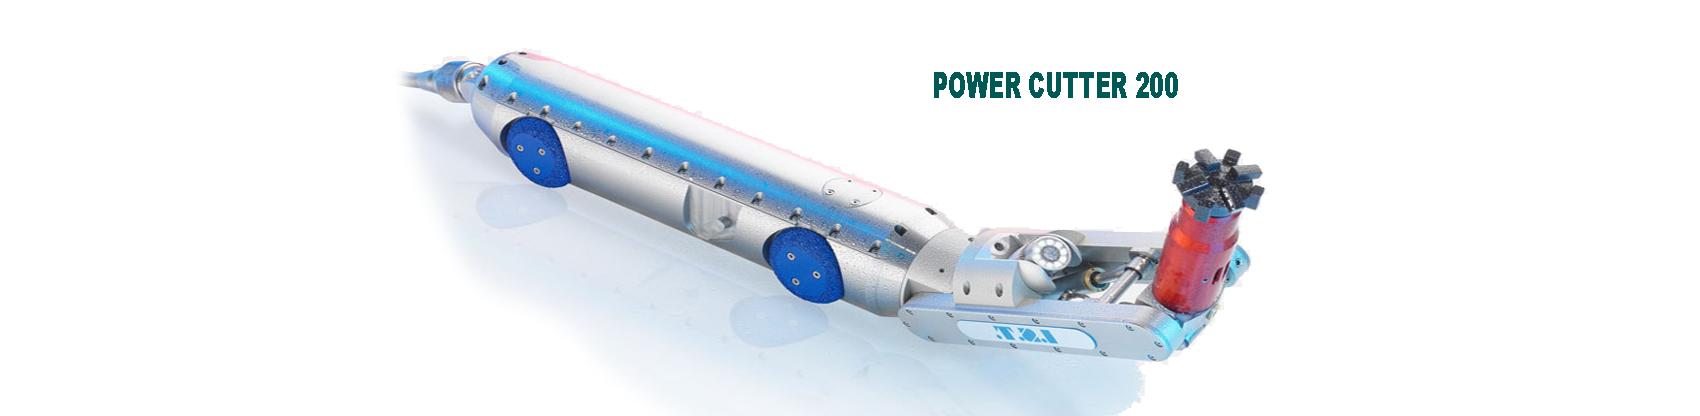 Slider Power Cutter 200